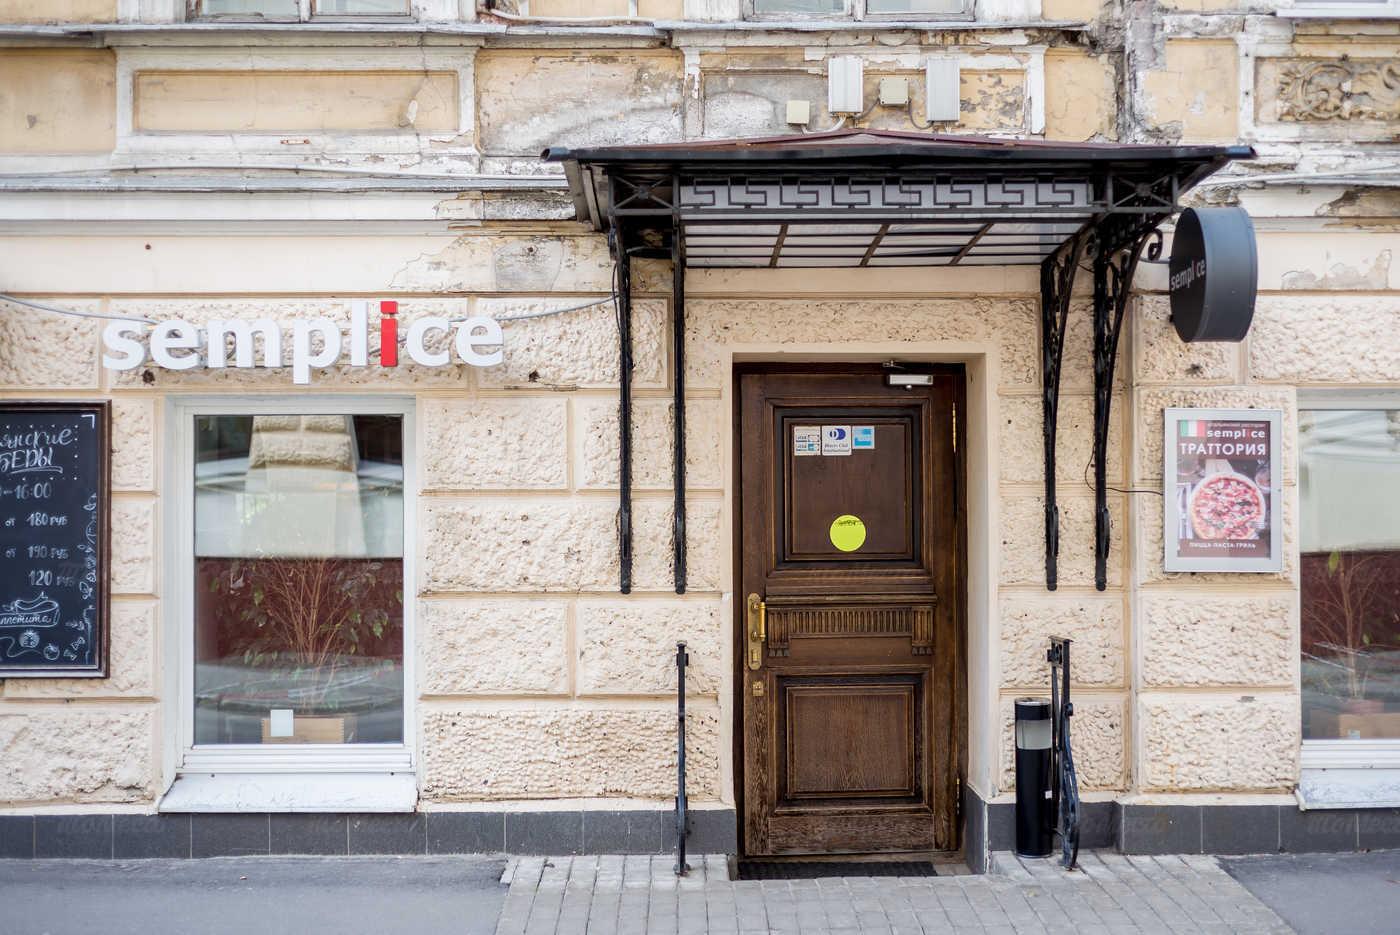 Ресторан Semplice (Траттория Семпличе) на улице Чаплыгина фото 22